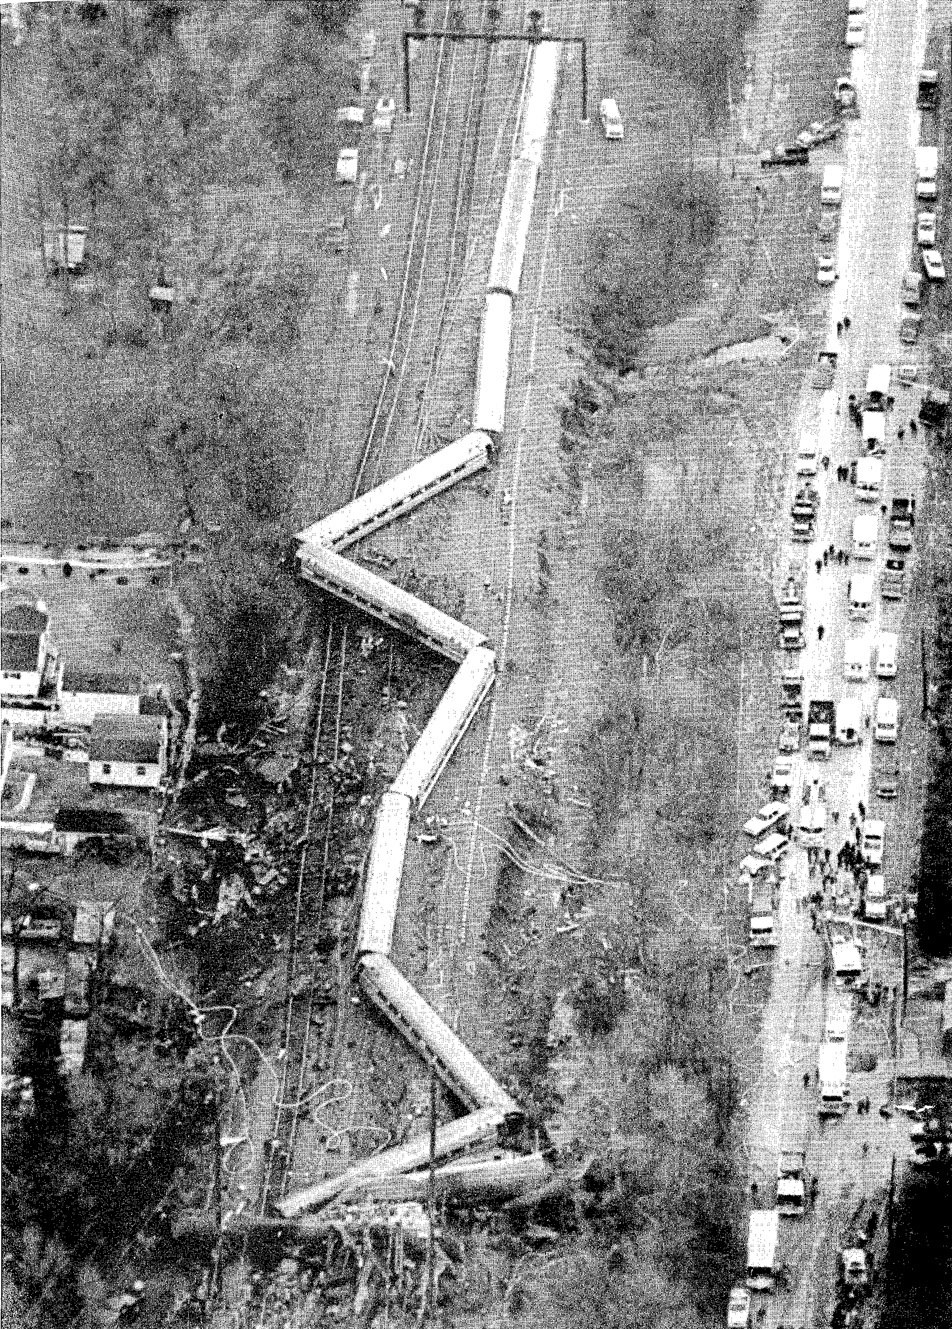 1987 Maryland train collision aerial